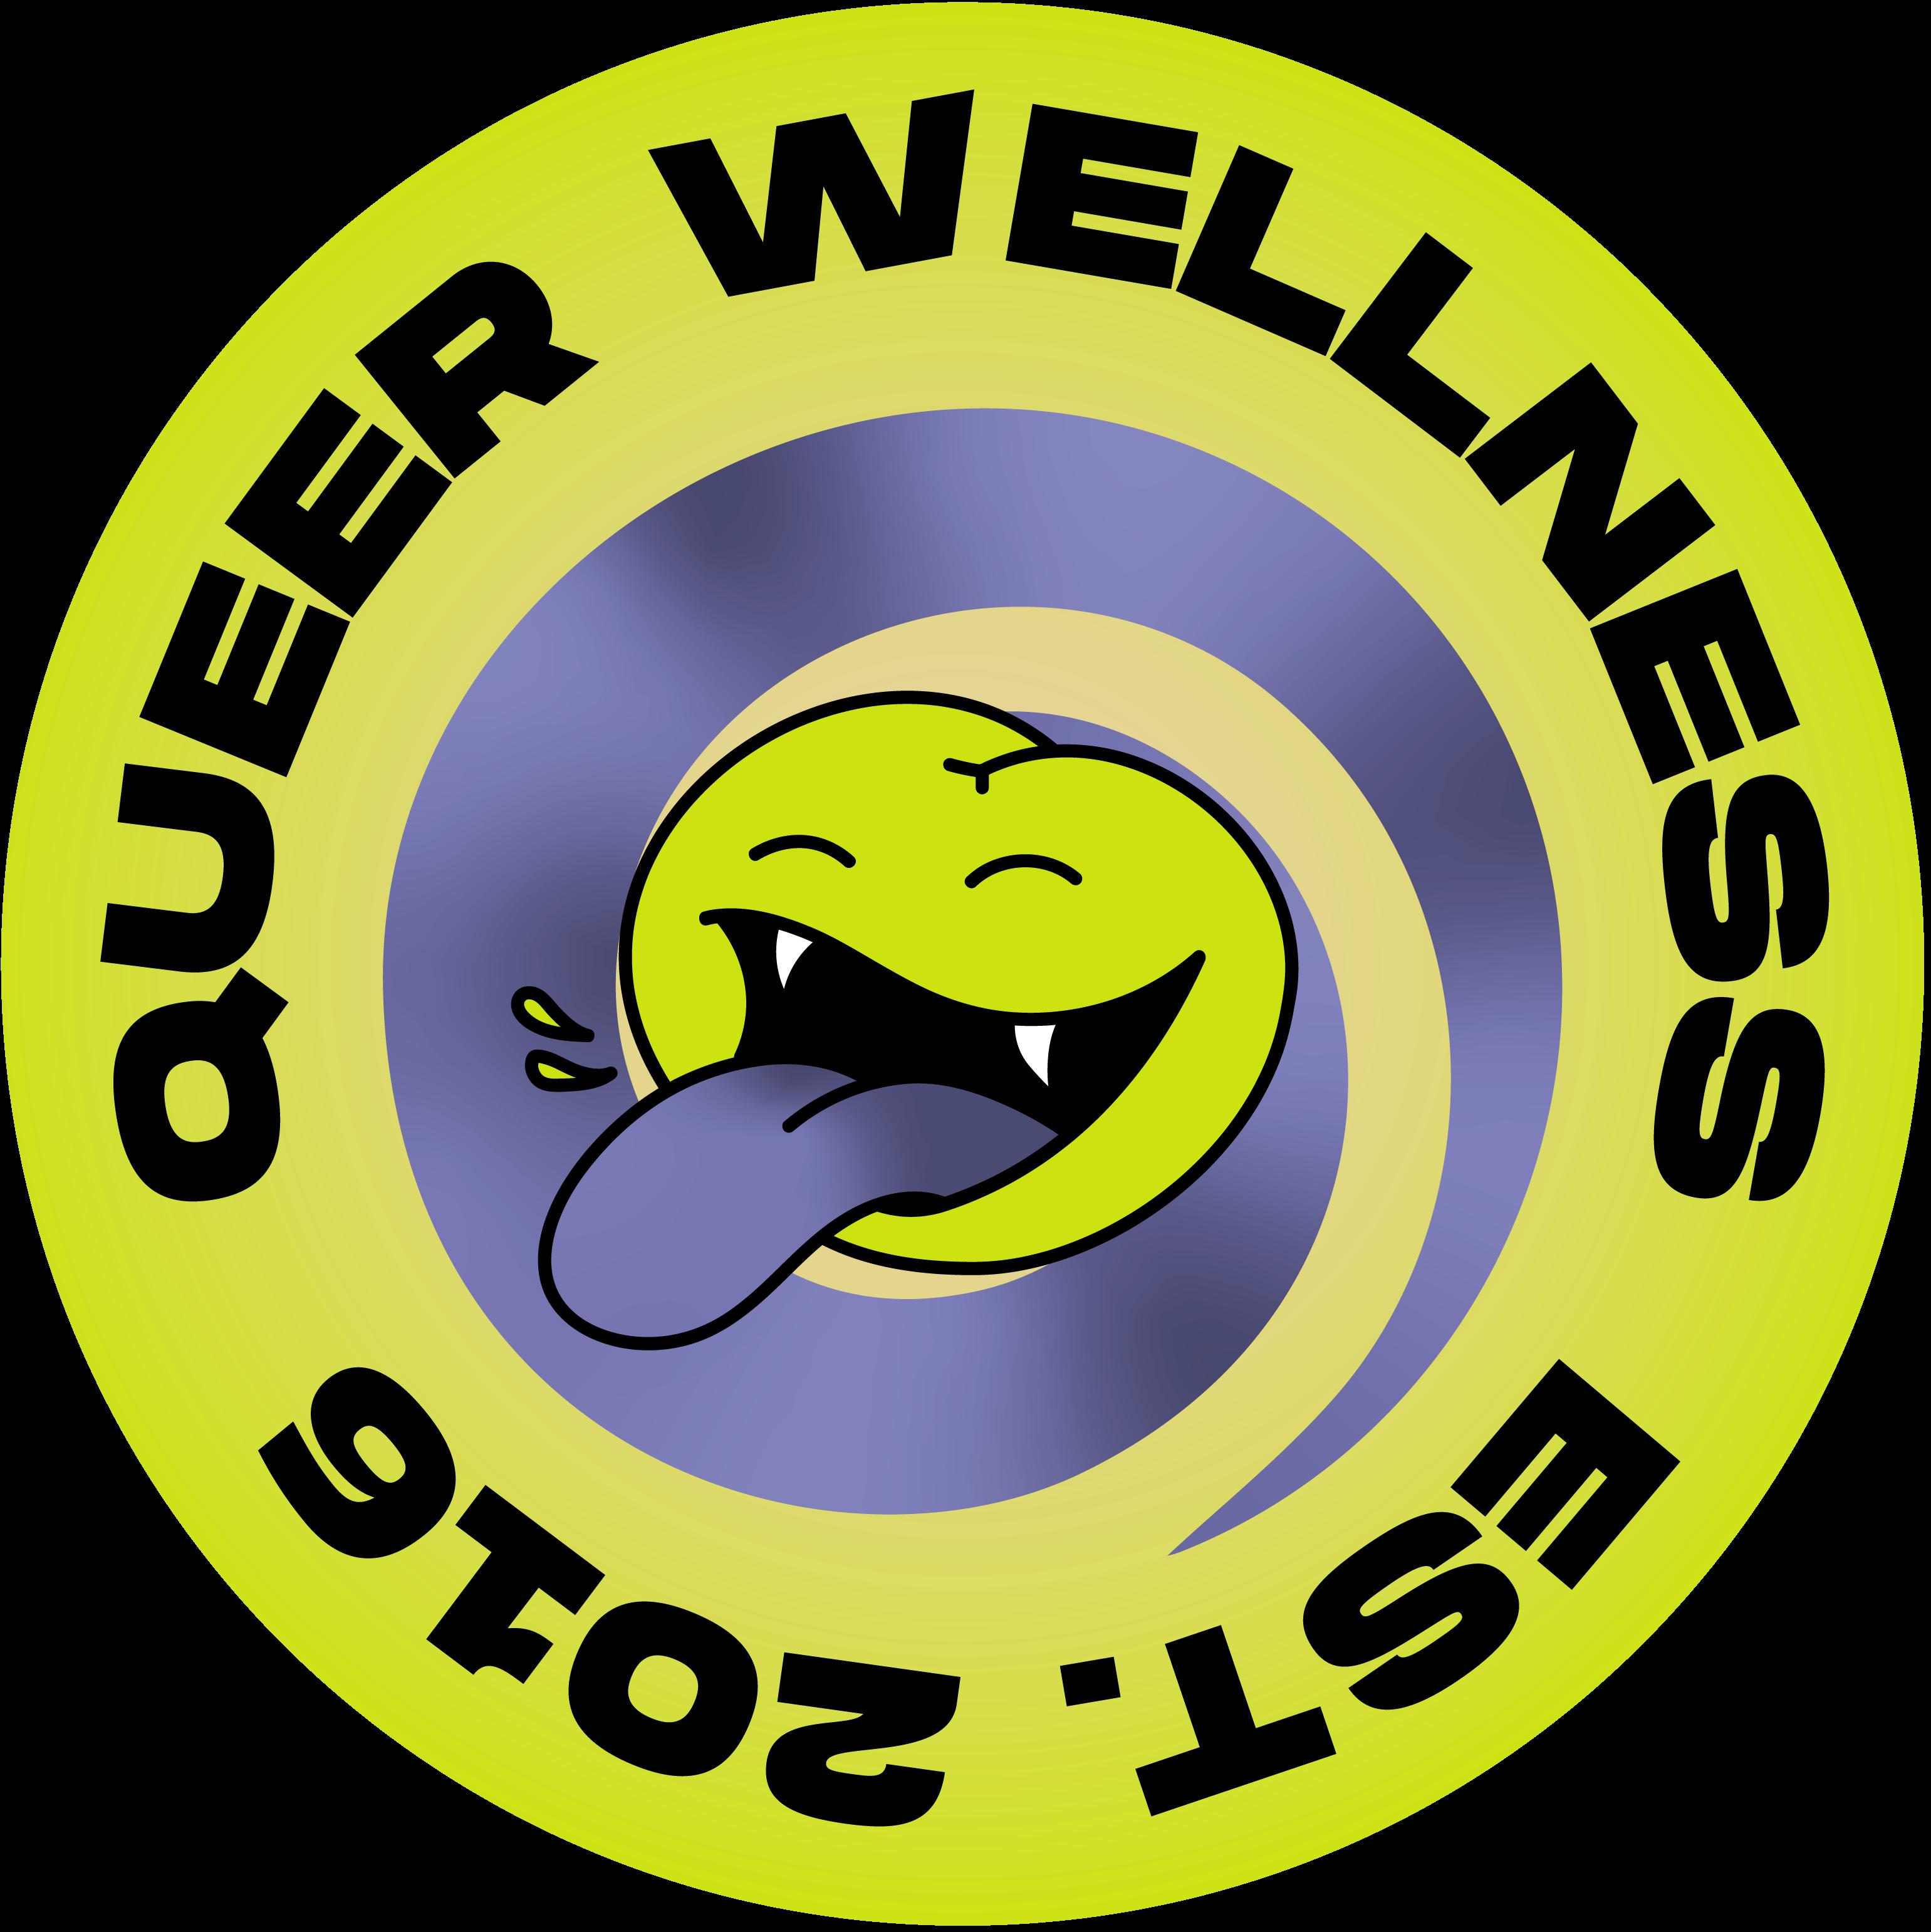 Queer Wellness est. 2016 logo animaition